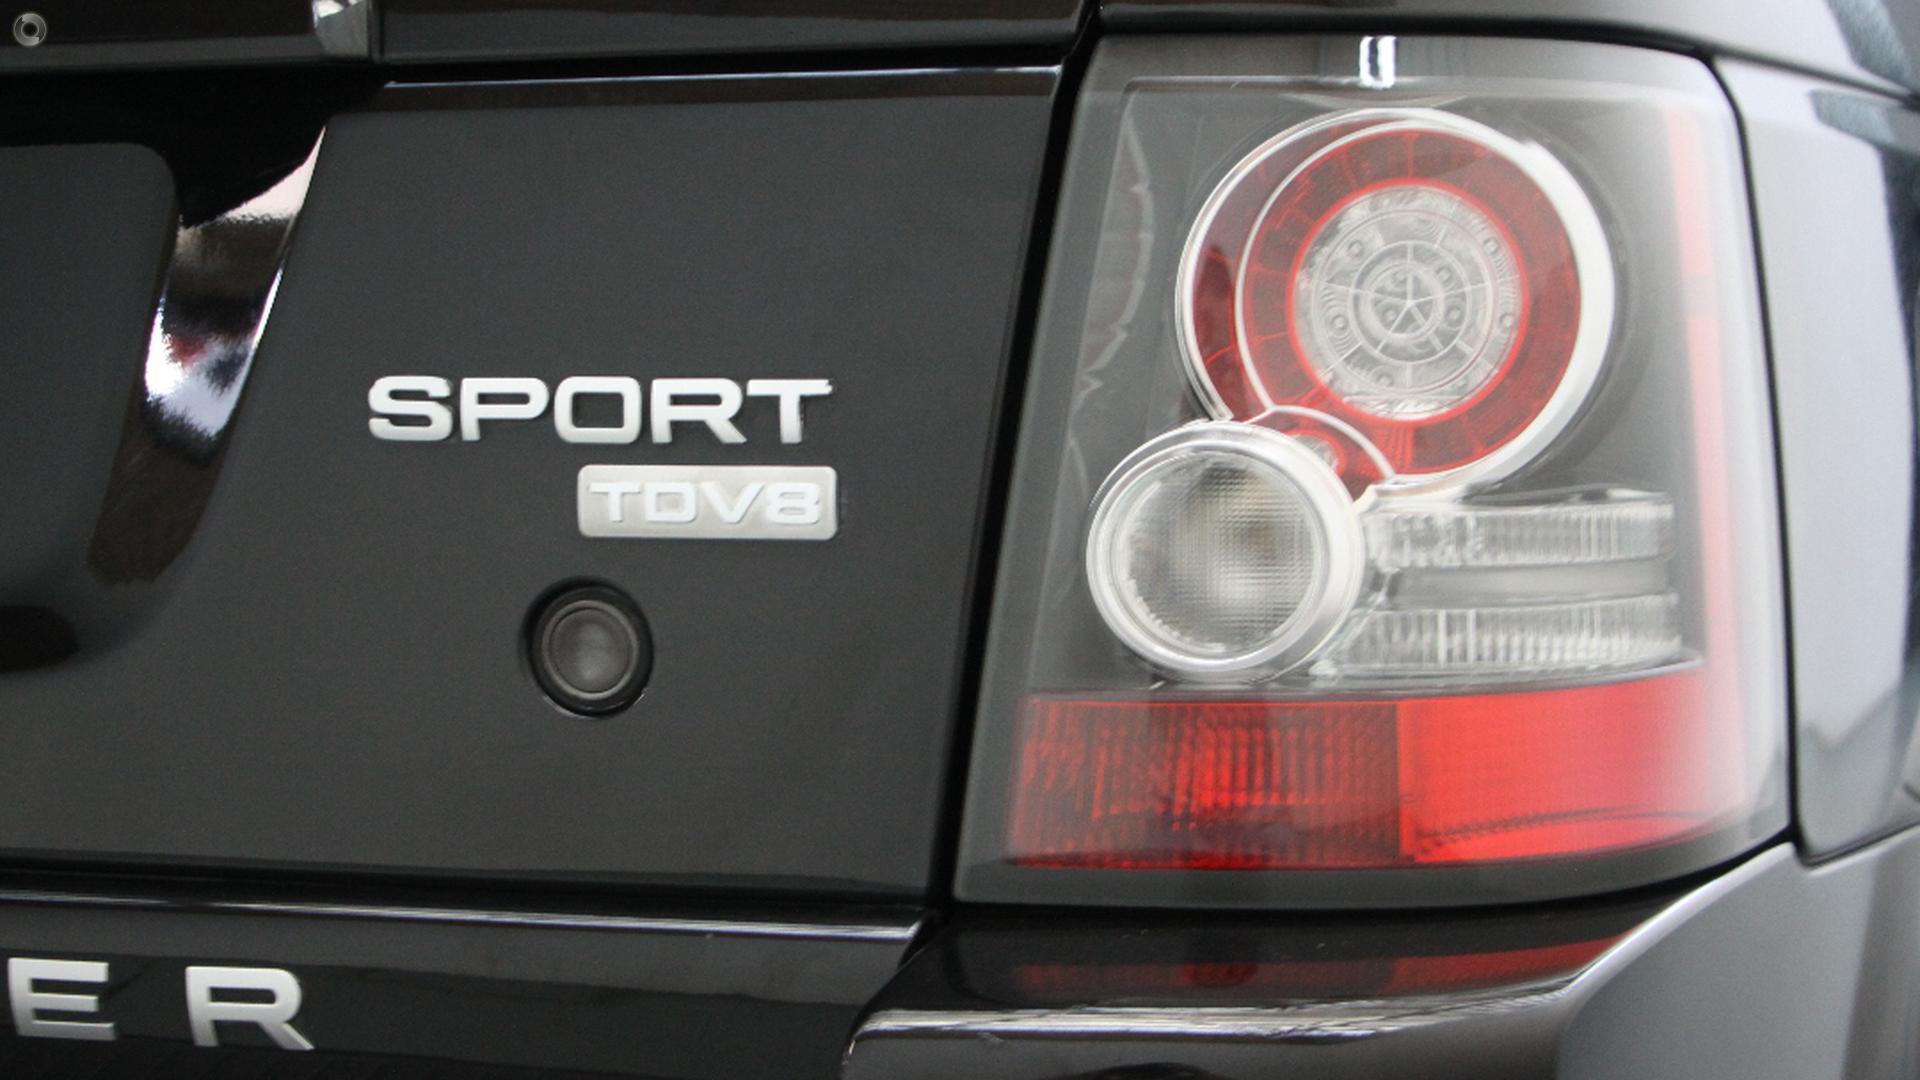 2010 Land Rover Range Rover Sport TDV8 L320